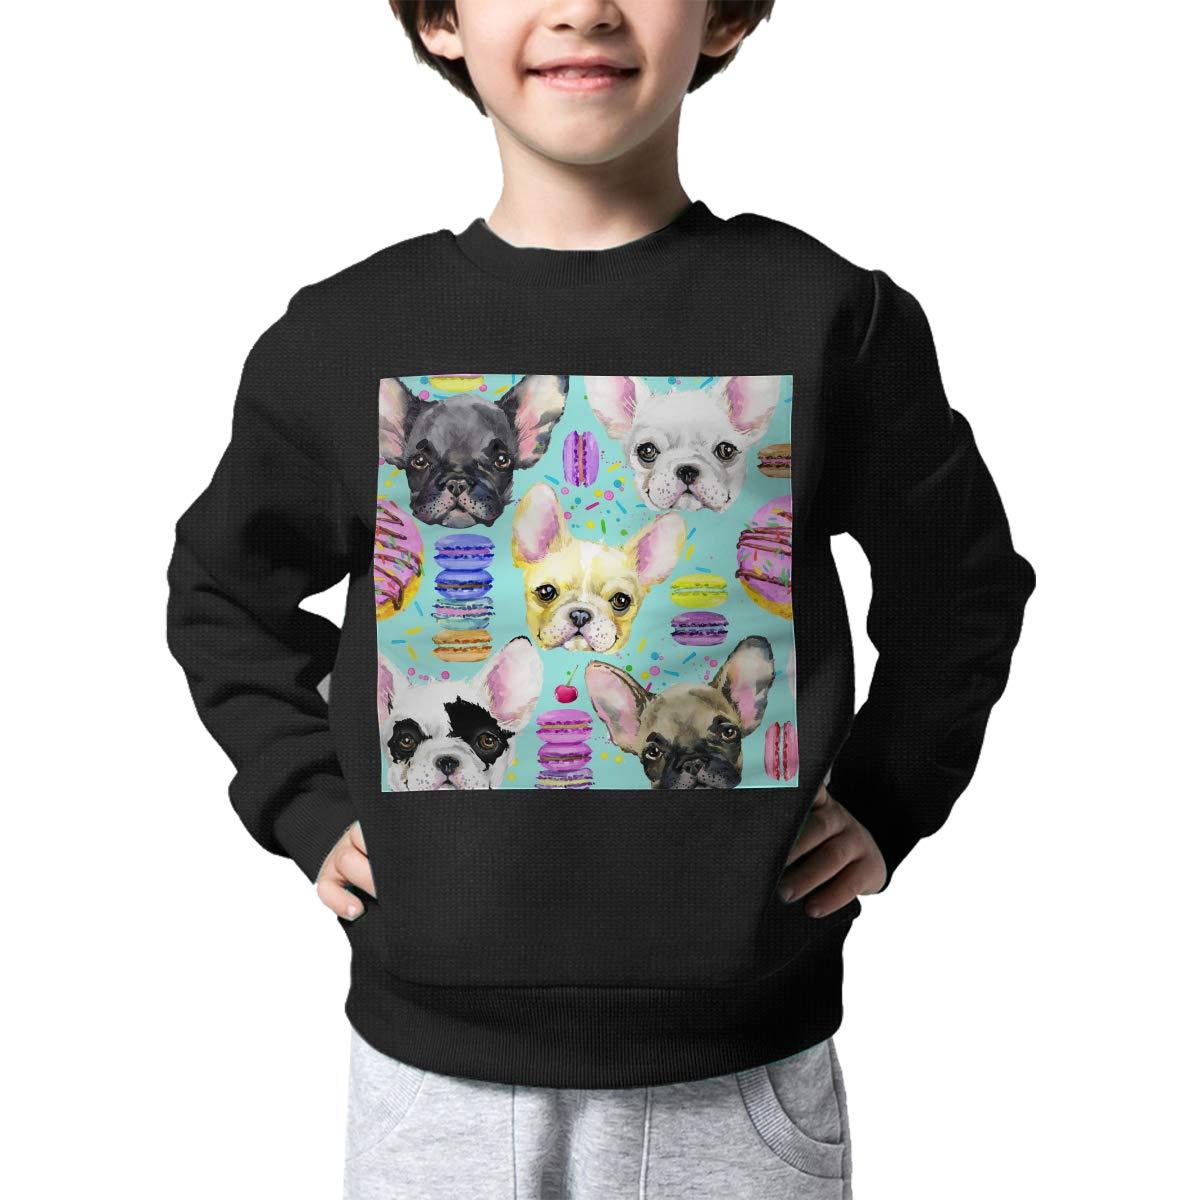 NJKM5MJ Boys Girls French Bulldog Pattern Lovely Sweaters Soft Warm Childrens Sweater